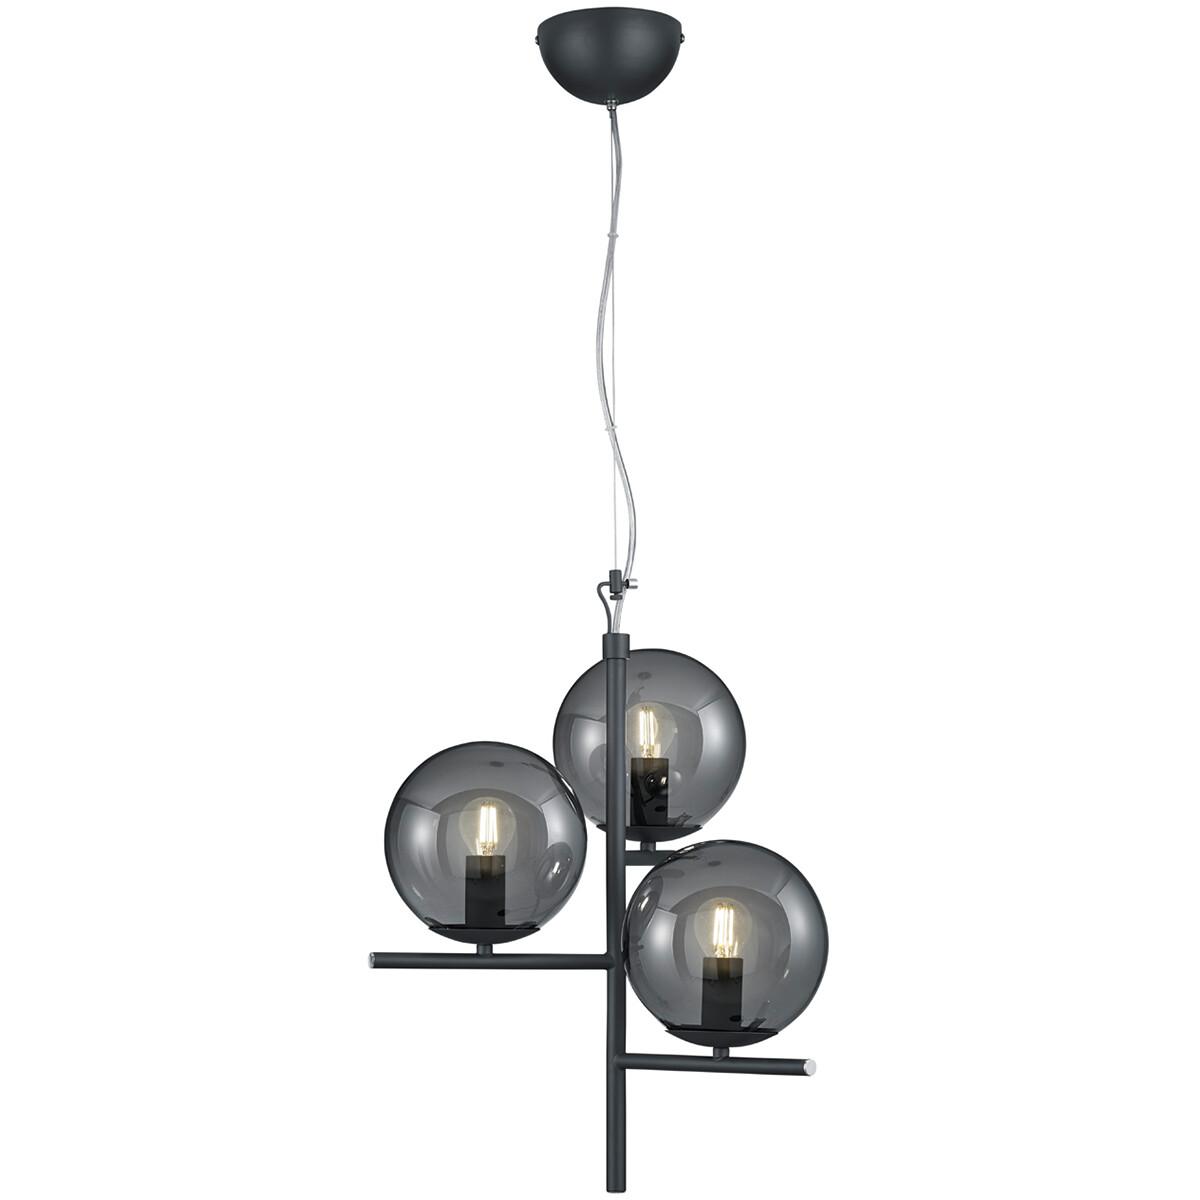 LED Hanglamp - Hangverlichting - Trion Pora - E14 Fitting - Rond - Mat Zwart - Aluminium